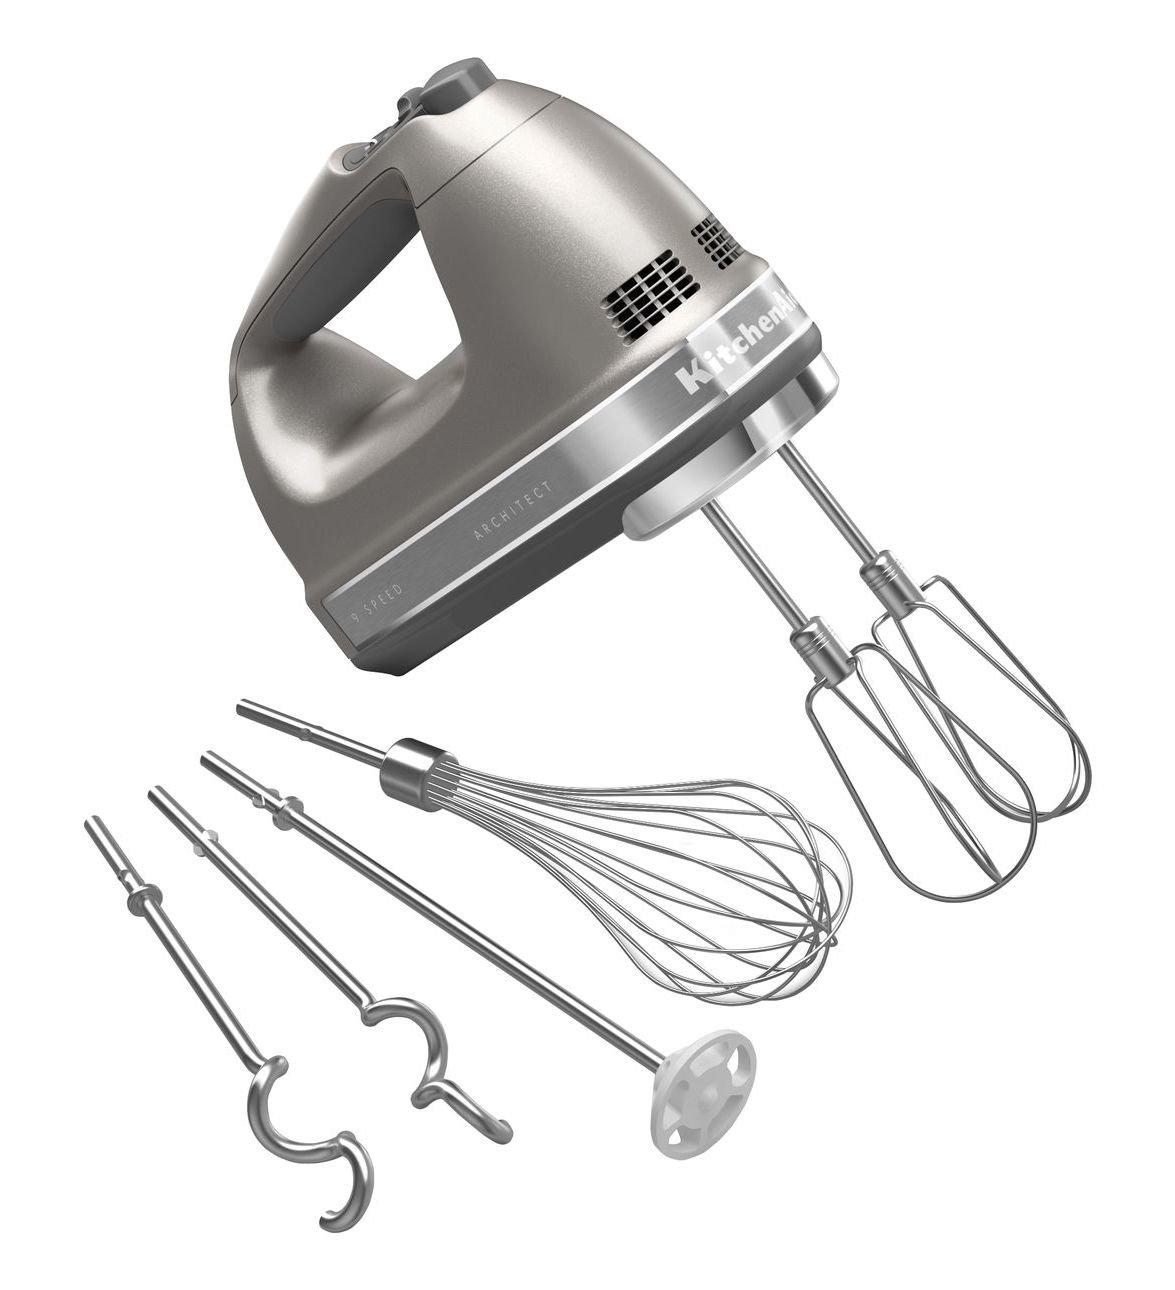 KitchenAid Architect Hand Mixer - 9-speed - Architect - Silver